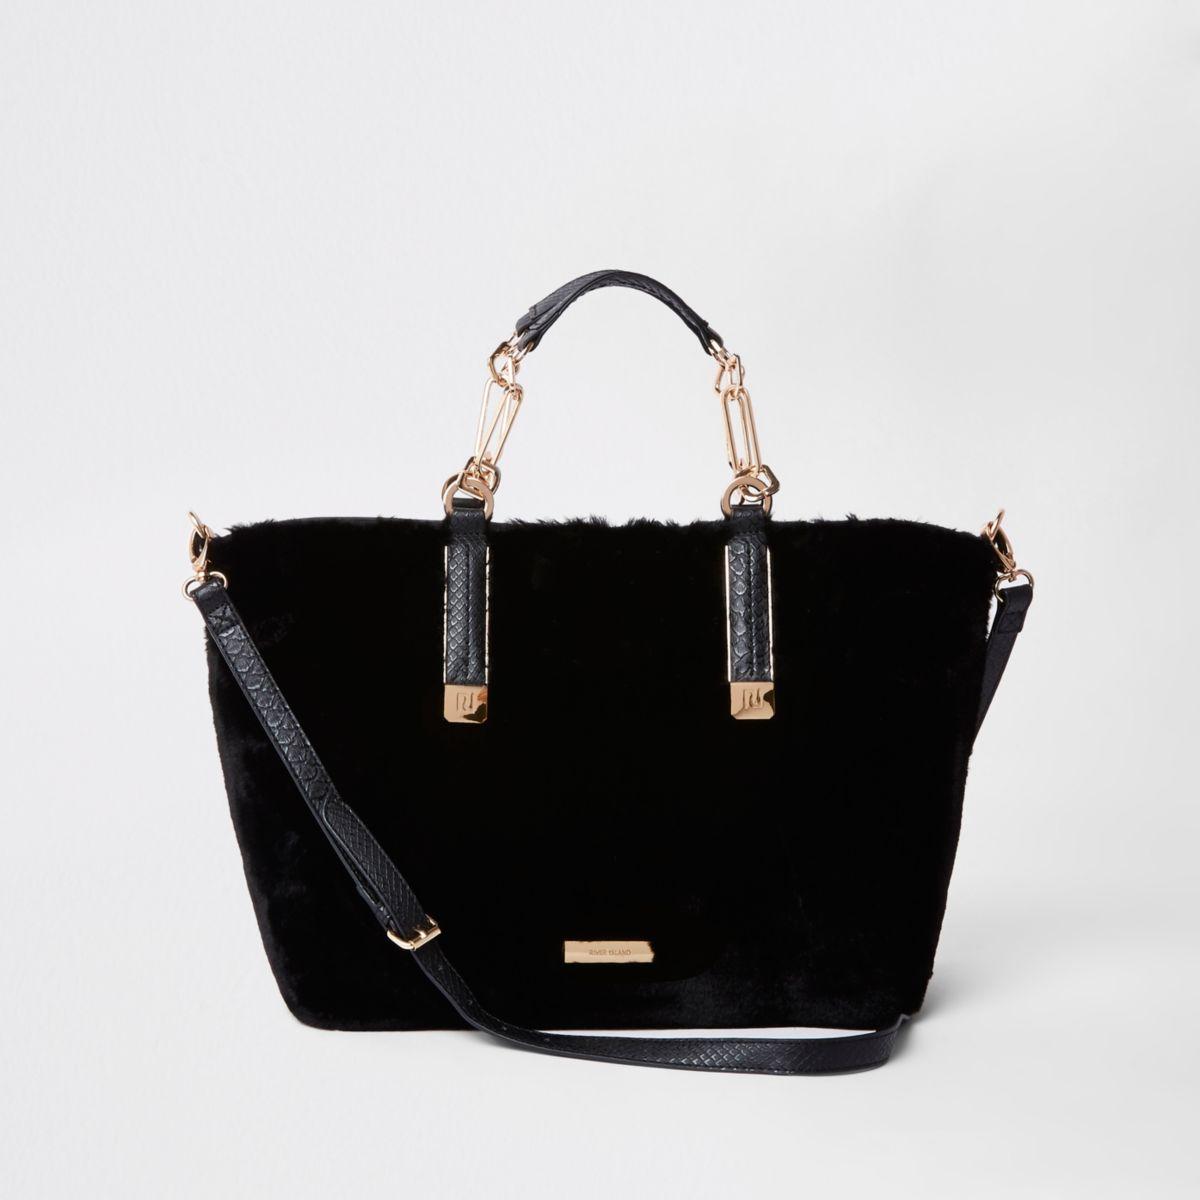 Schwarze Tote Bag aus Kunstfell